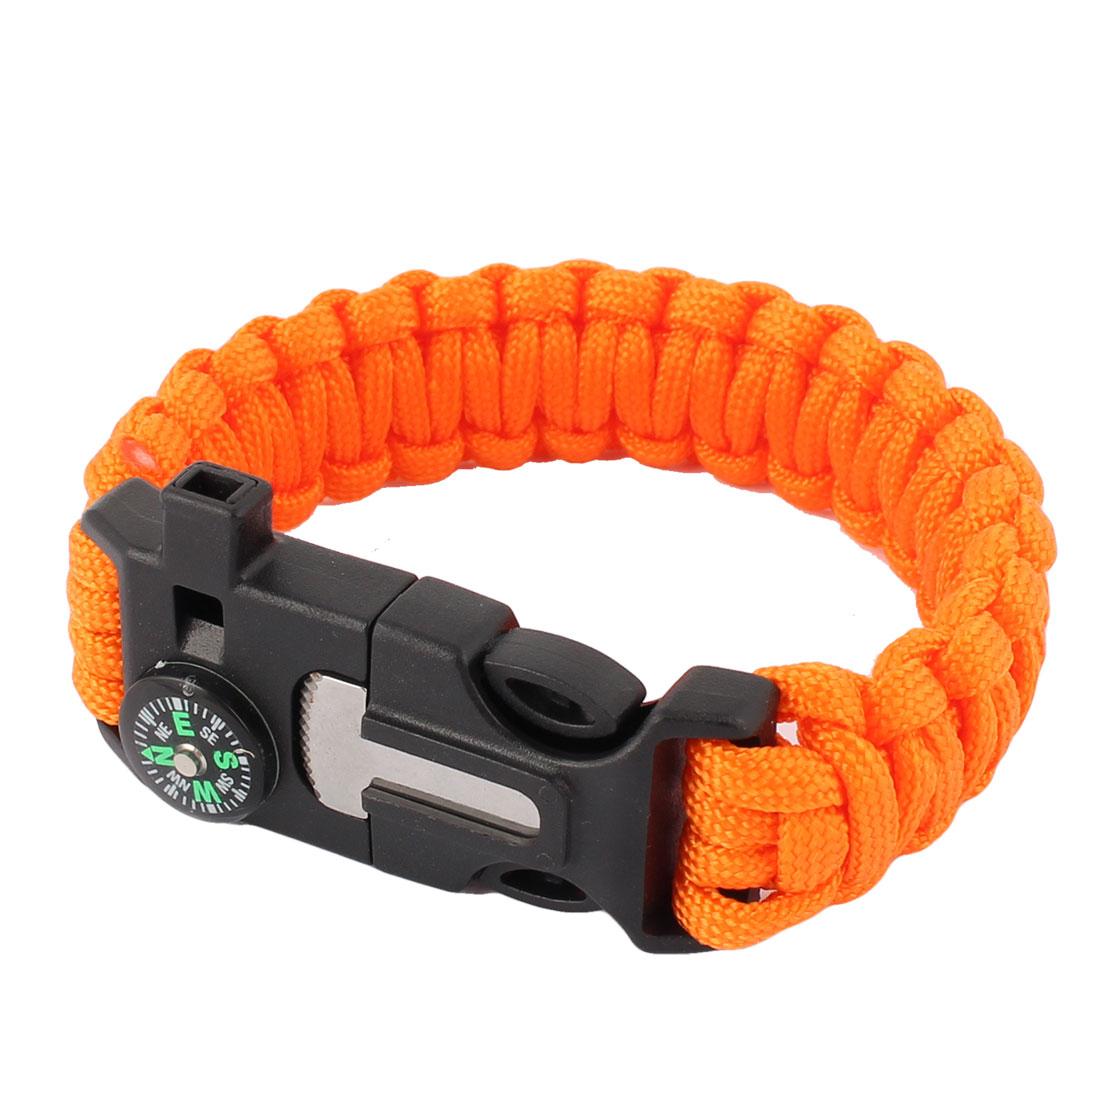 Outside Hiking Camping Multifunctional Design Survival Bracelet Gear